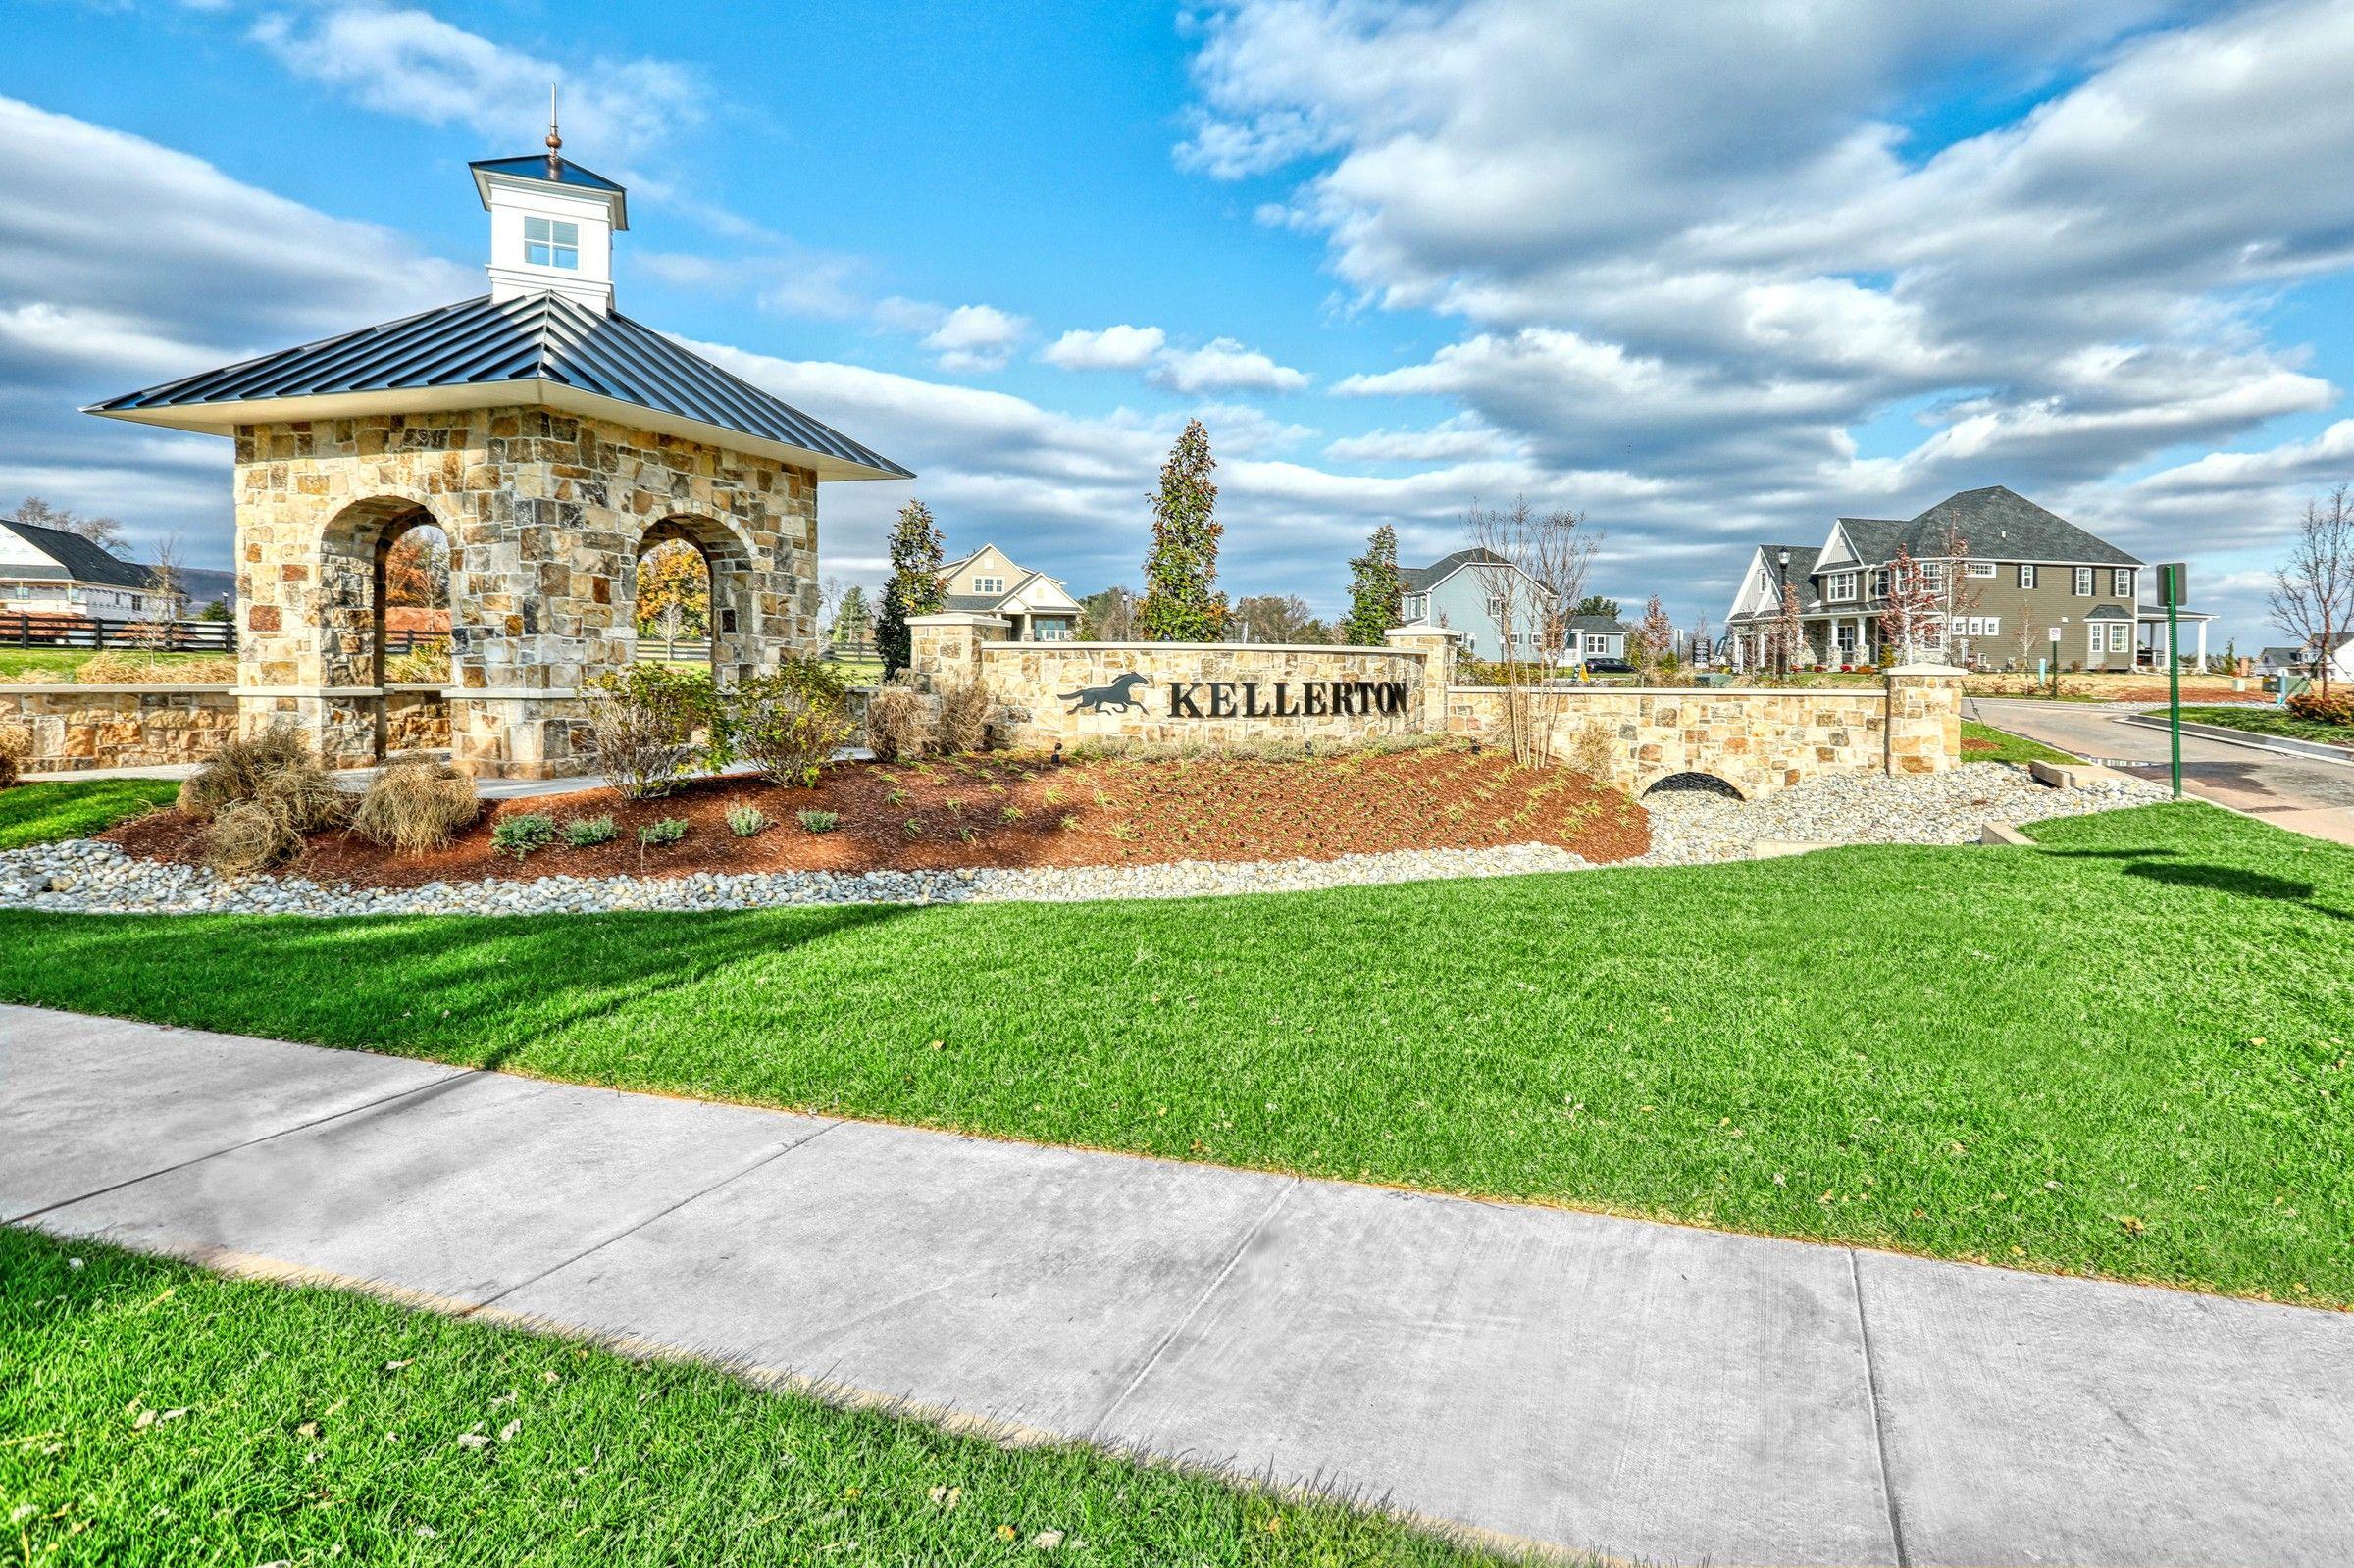 'Kellerton' by Keystone Custom Homes in Washington